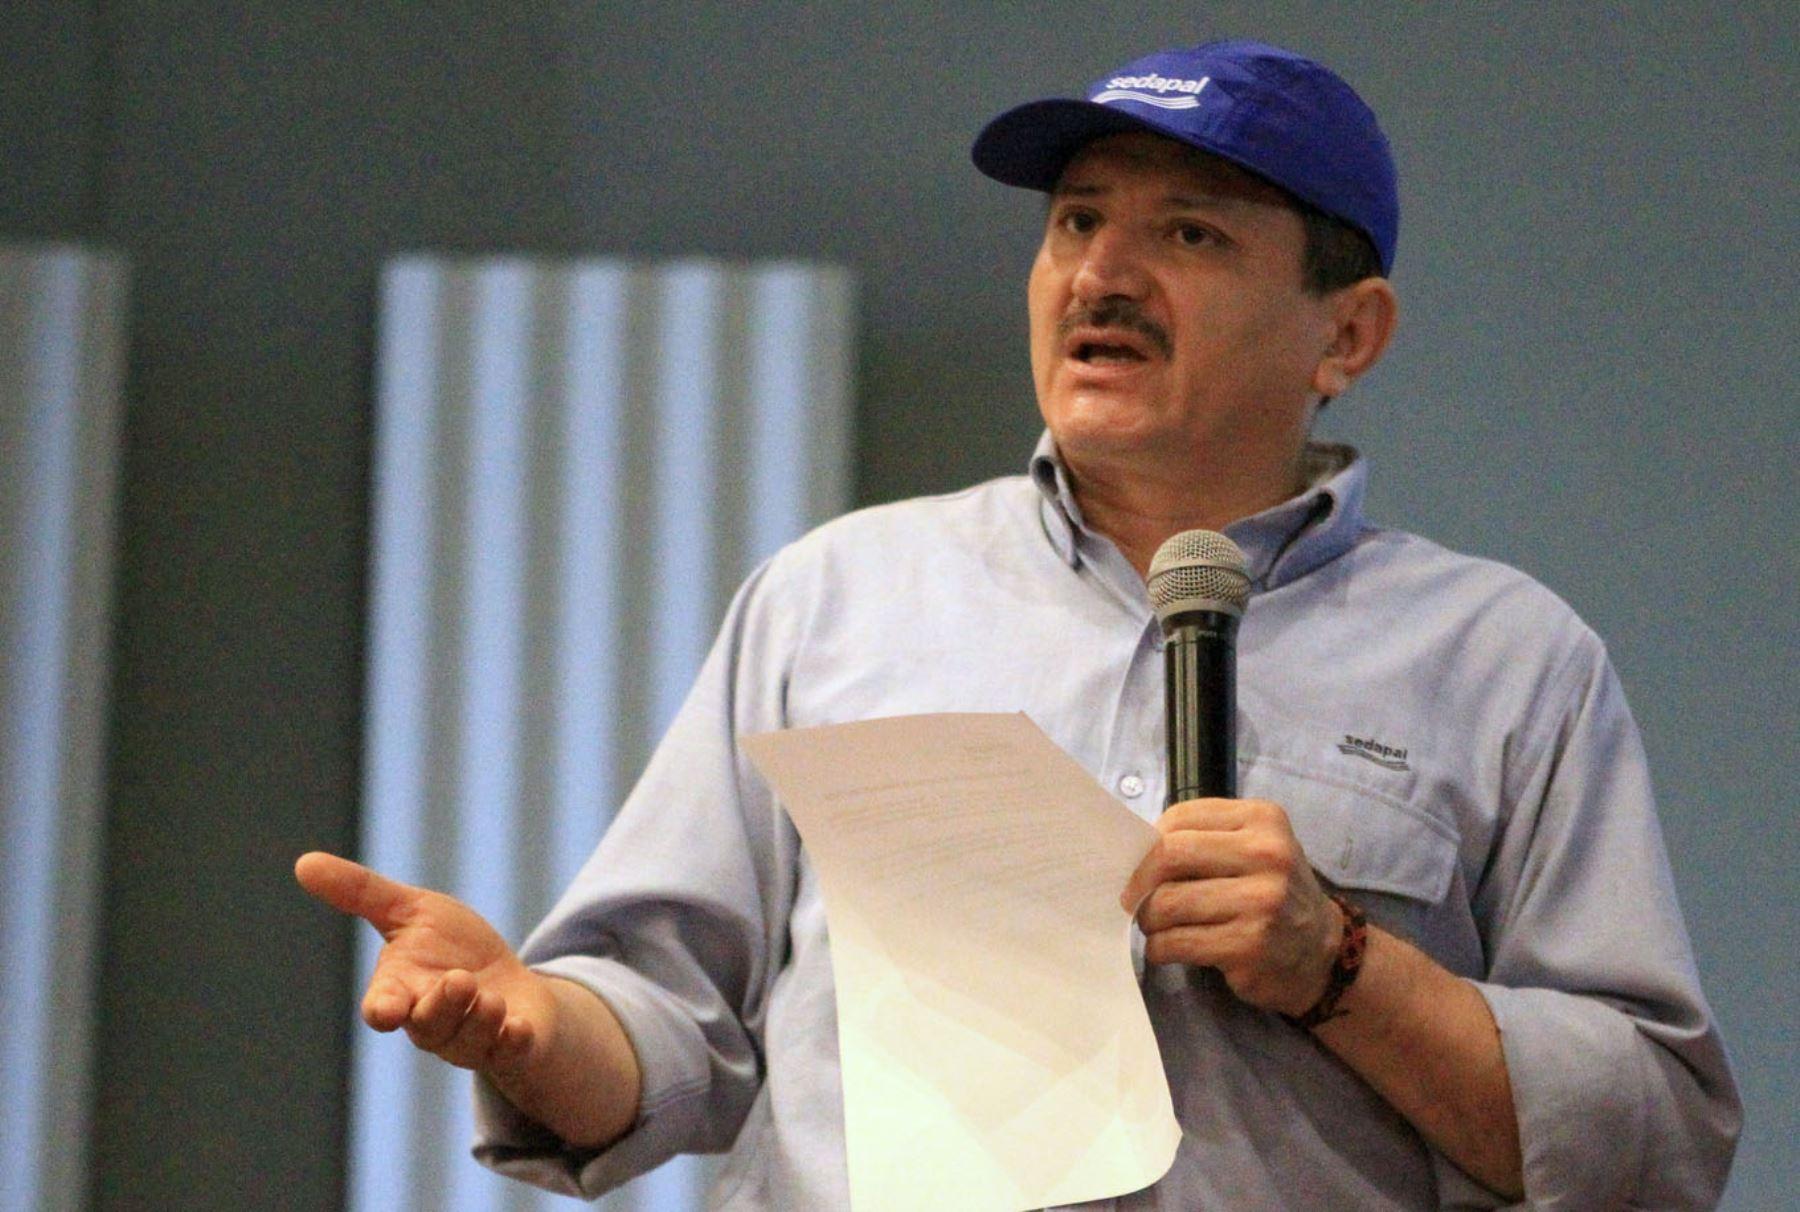 Presidente del Directorio de Sedapal, Rudecindo Vega. ANDINA/Héctor Vinces